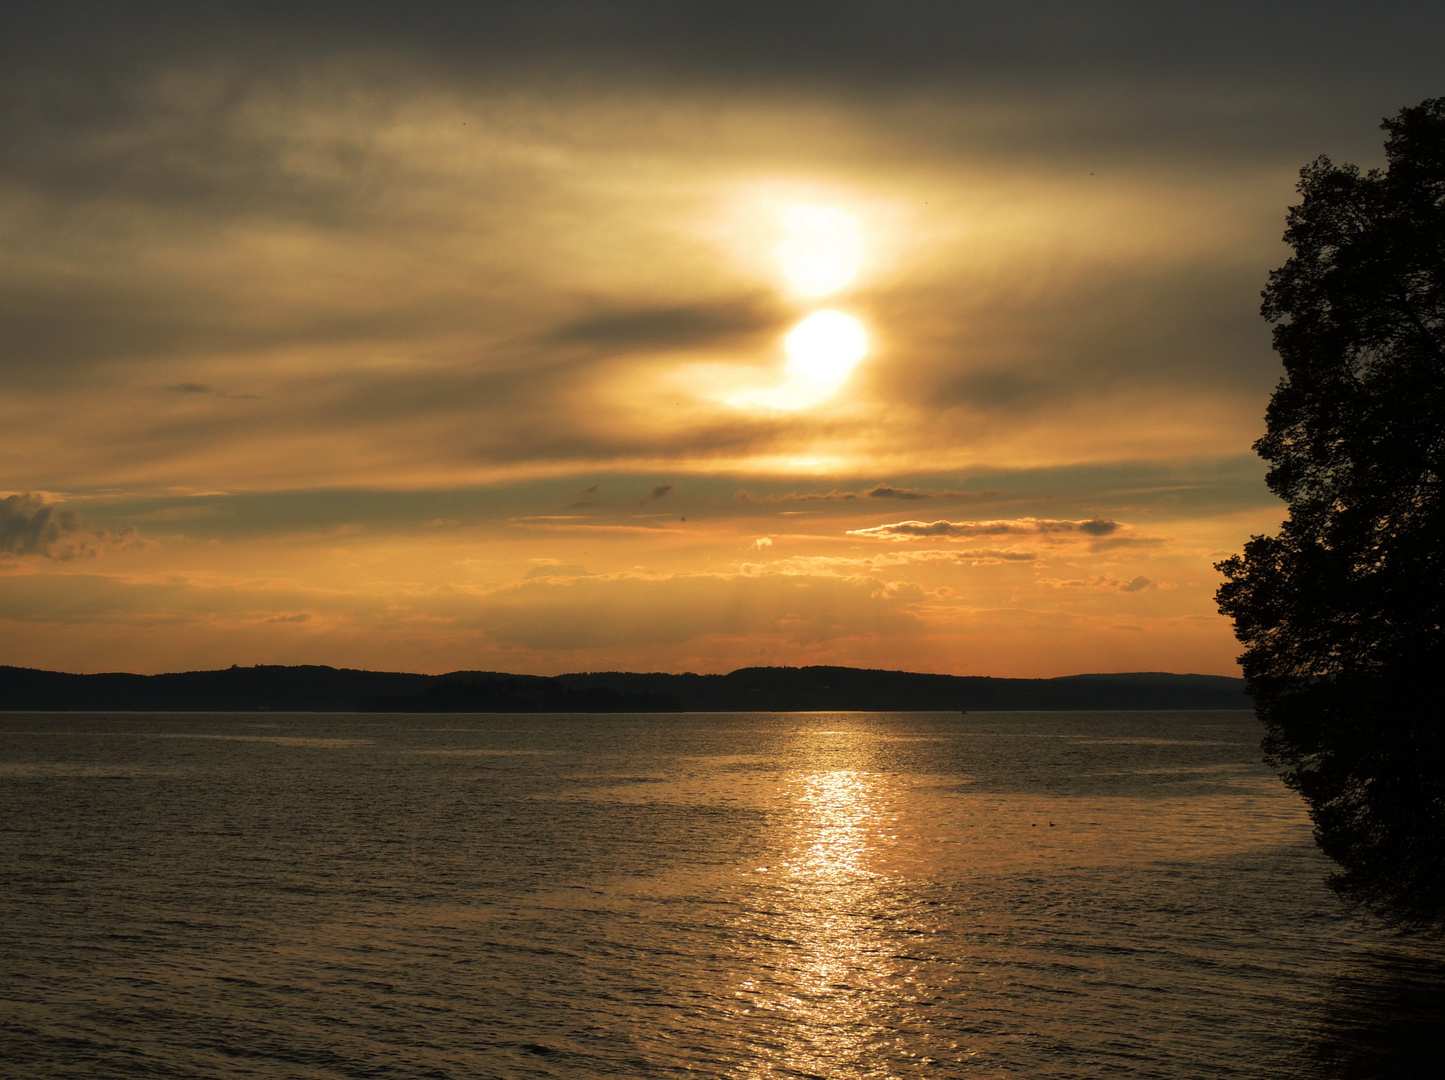 Sonnenuntergang am Bodensee II